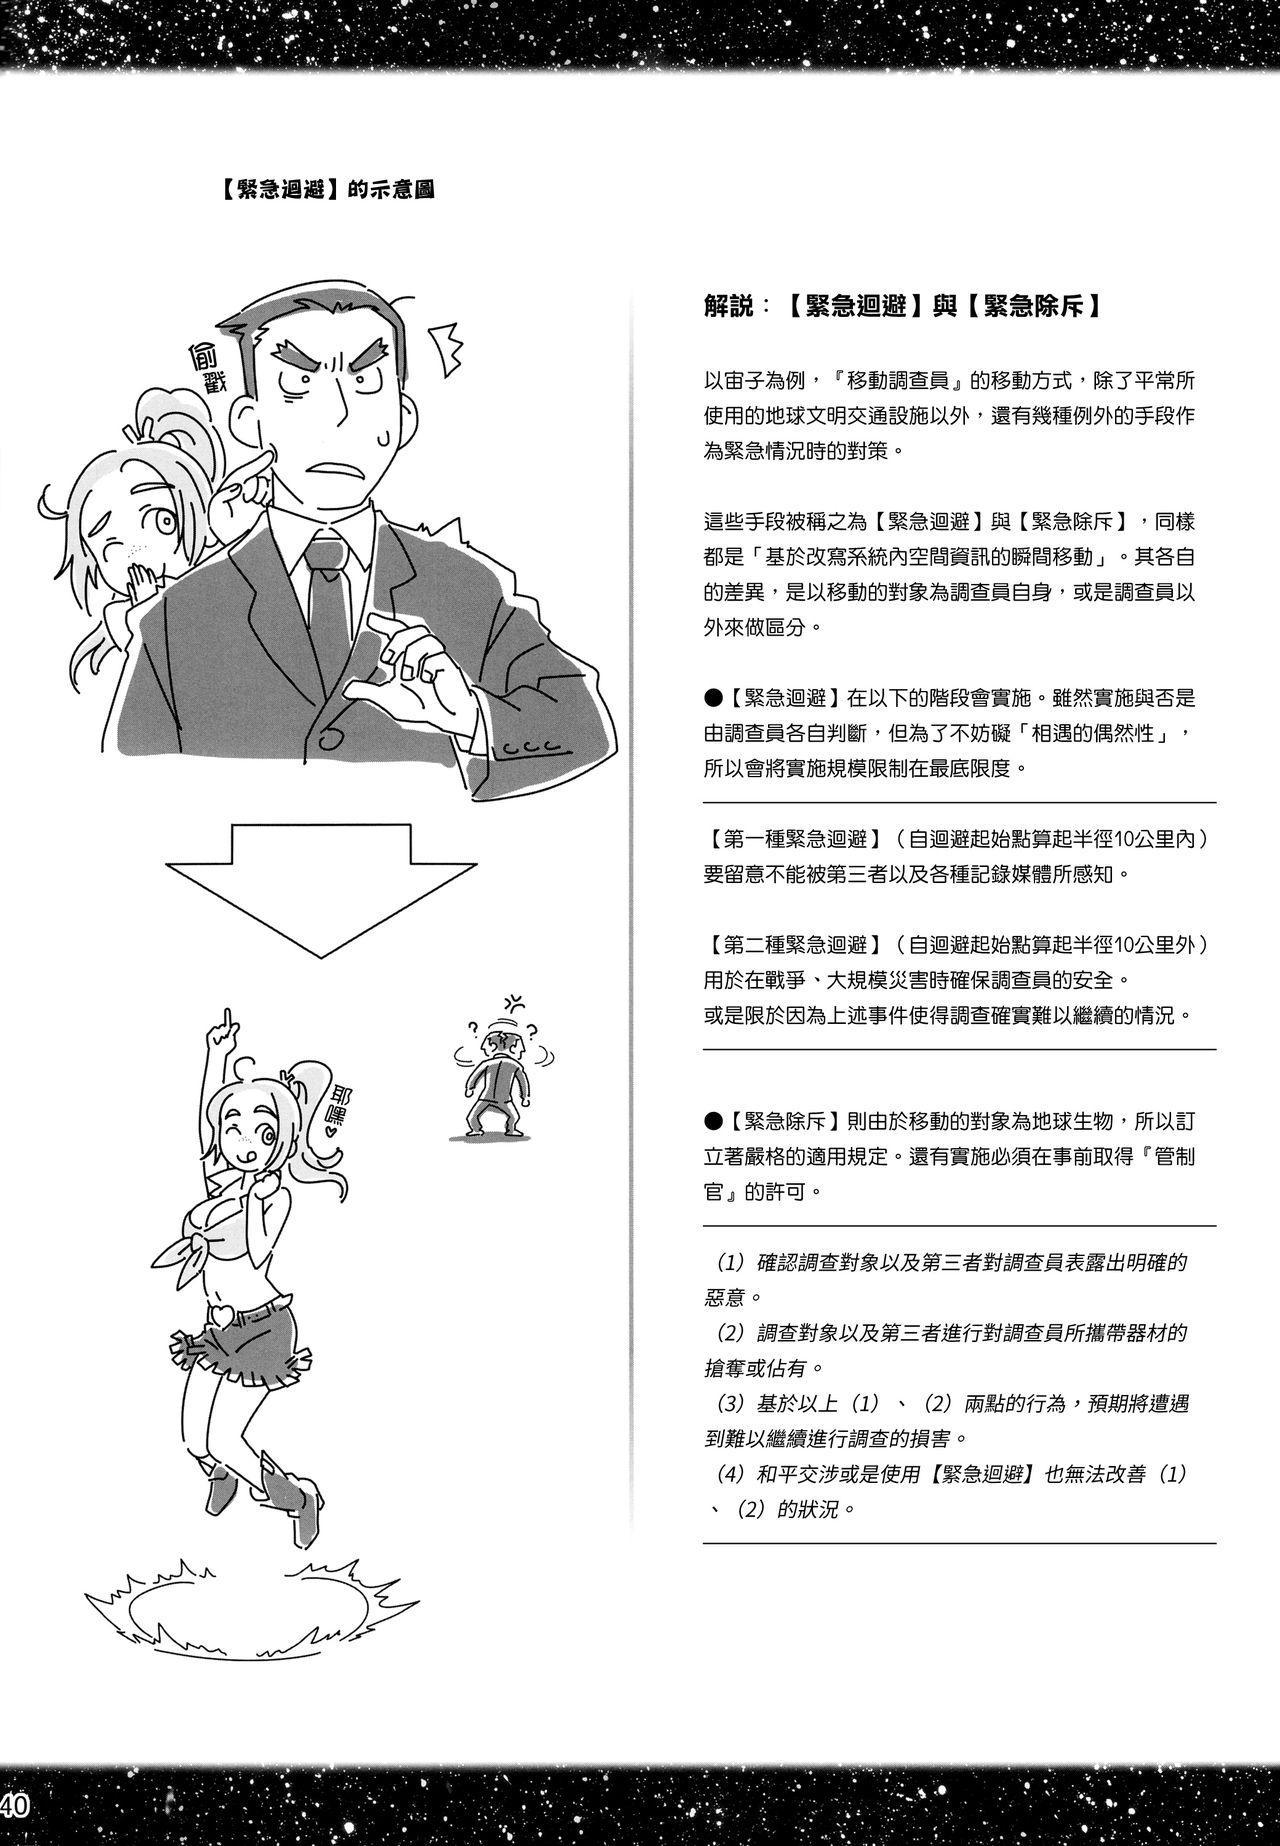 Sorako no Tabi 6 34